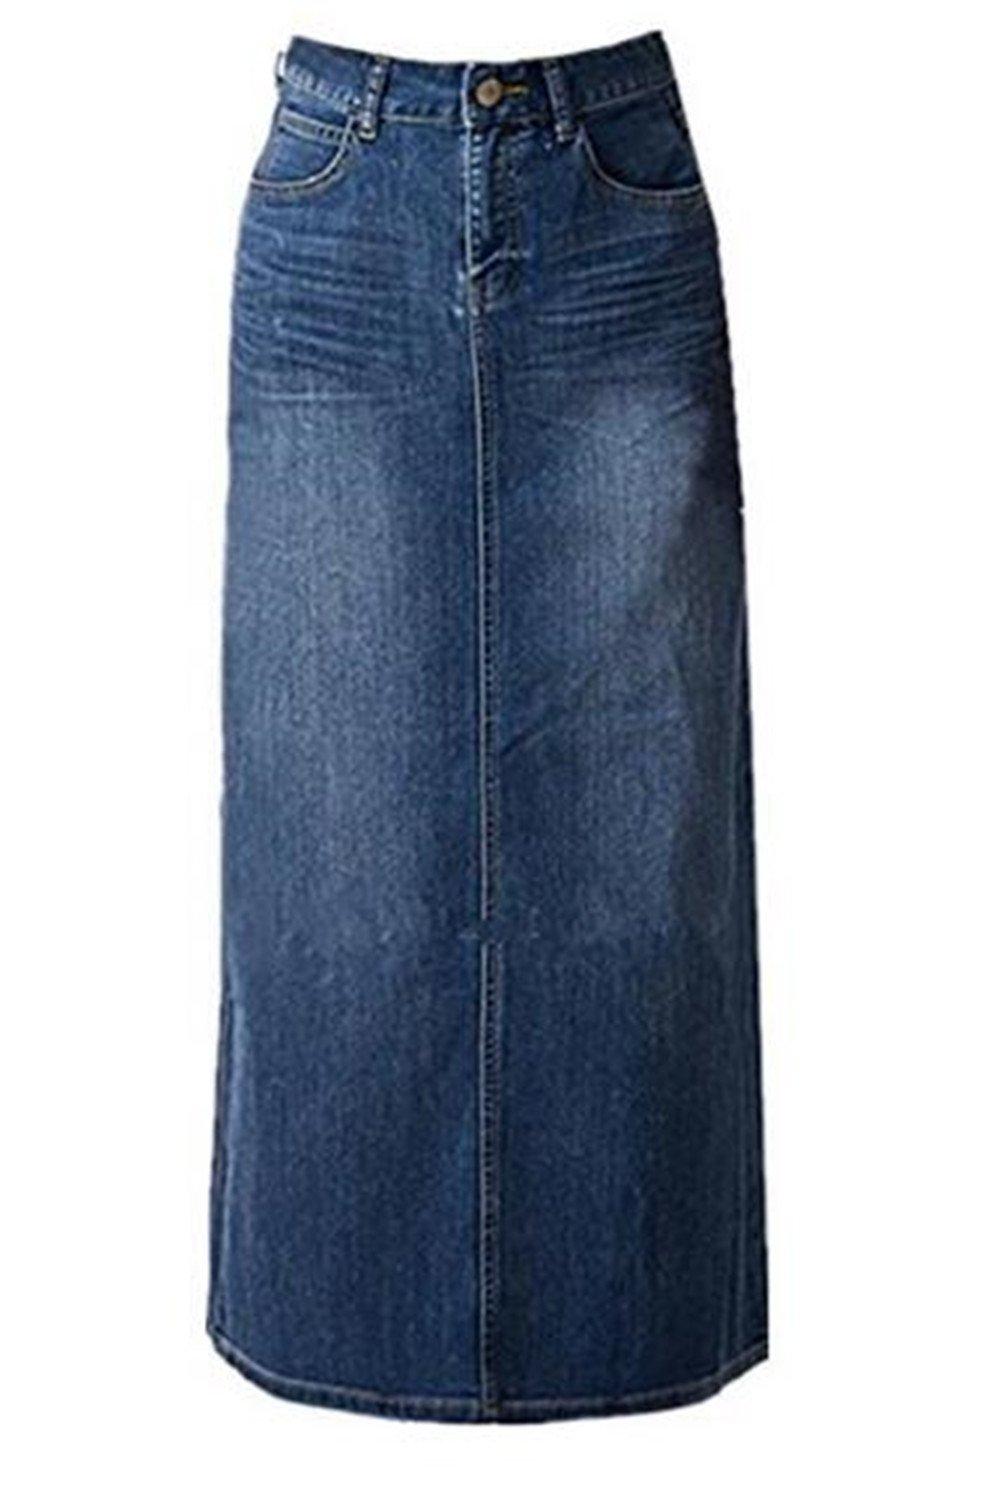 Women's Maxi Pencil Jean Skirt- High Waisted A-Line Long Denim Skirts For Ladies- Blue Jean Skirt,Blue,20 Plus